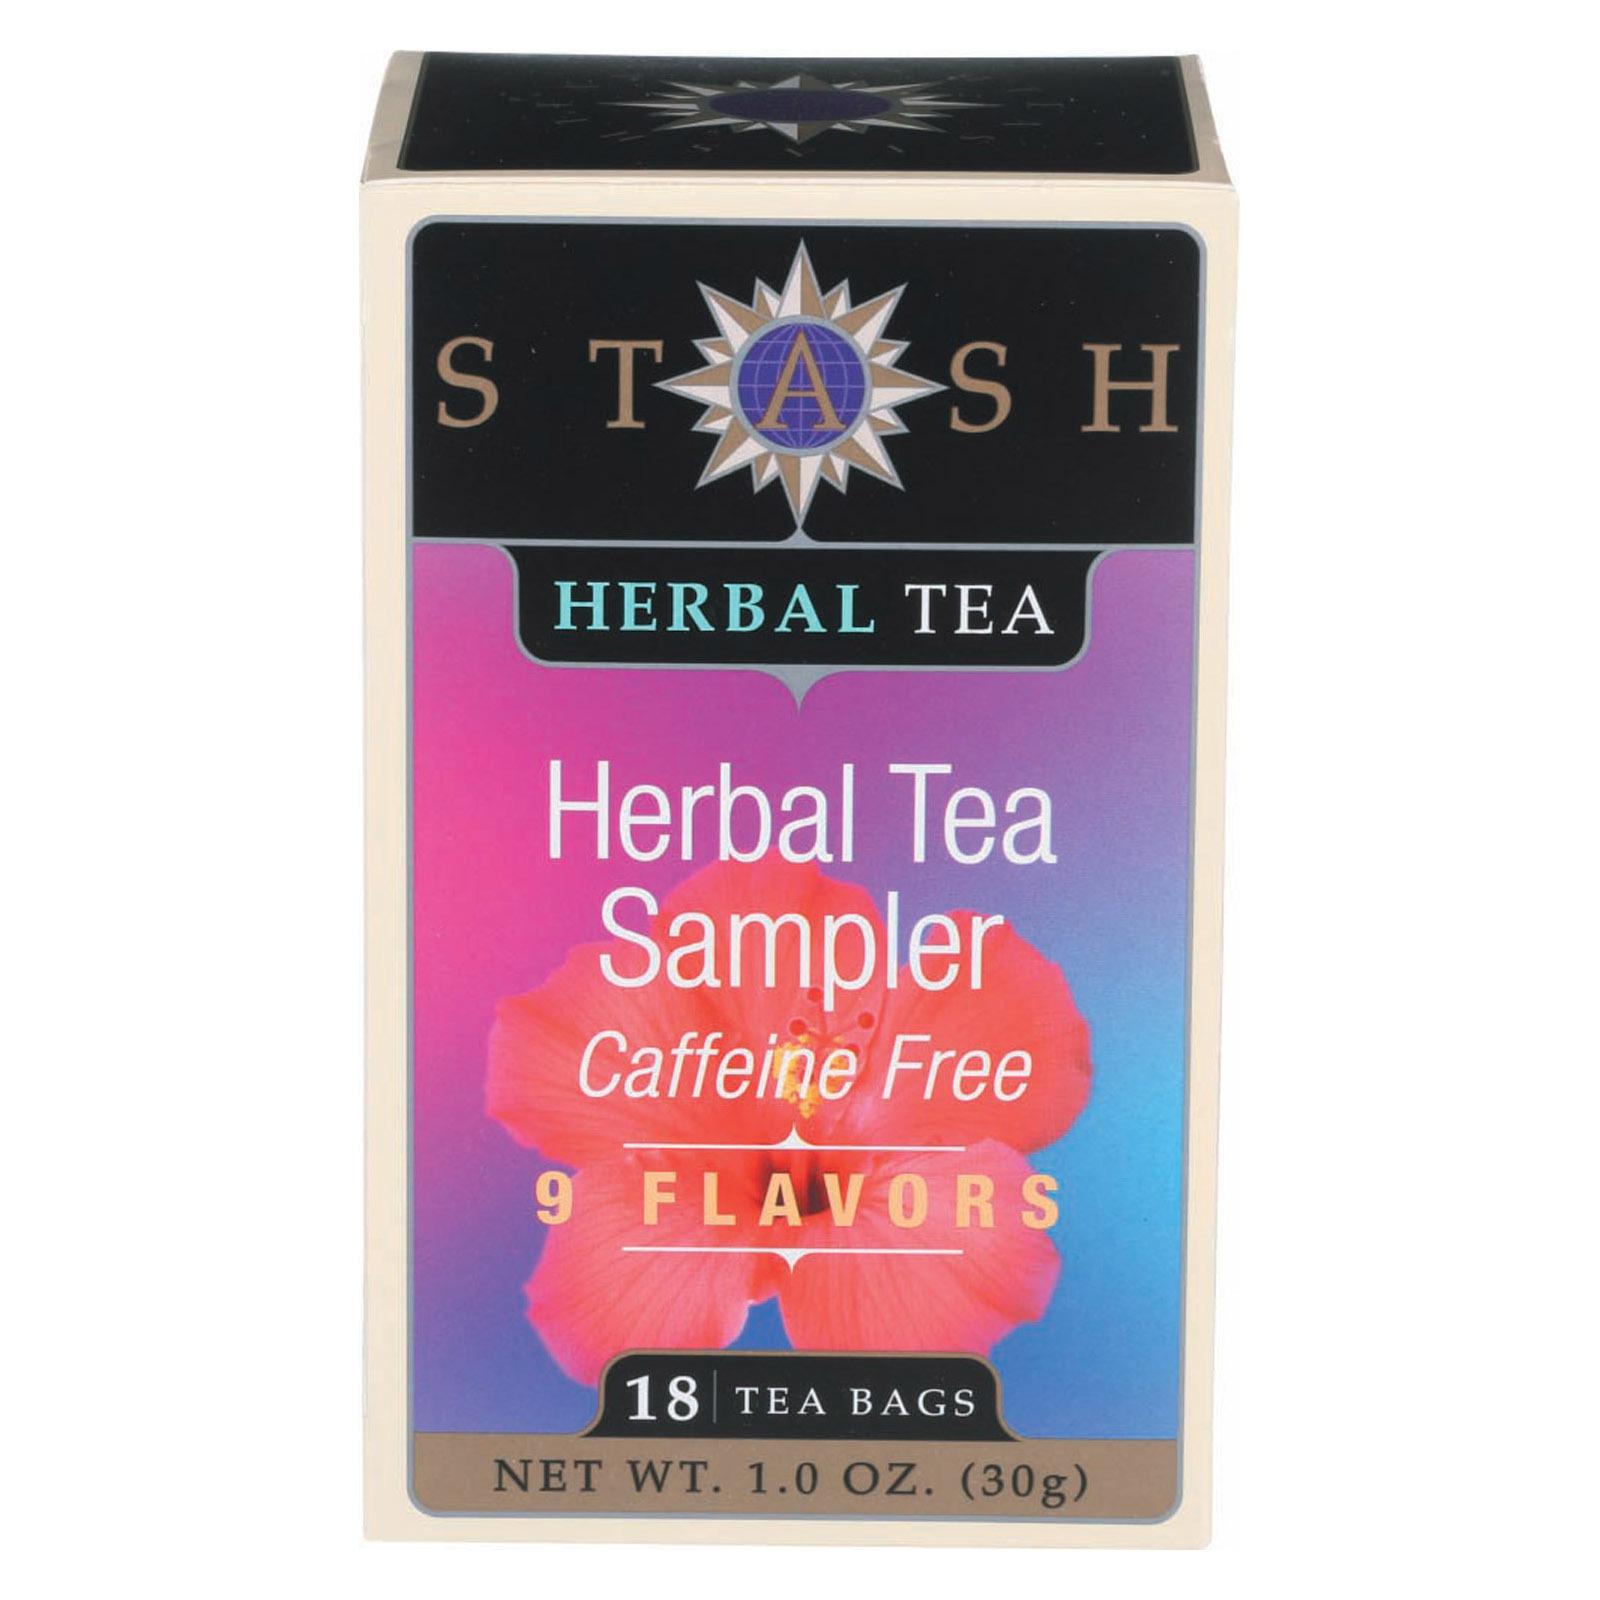 Stash Tea Tea - Herbal - Sampler - Case of 6 - 18 BAG